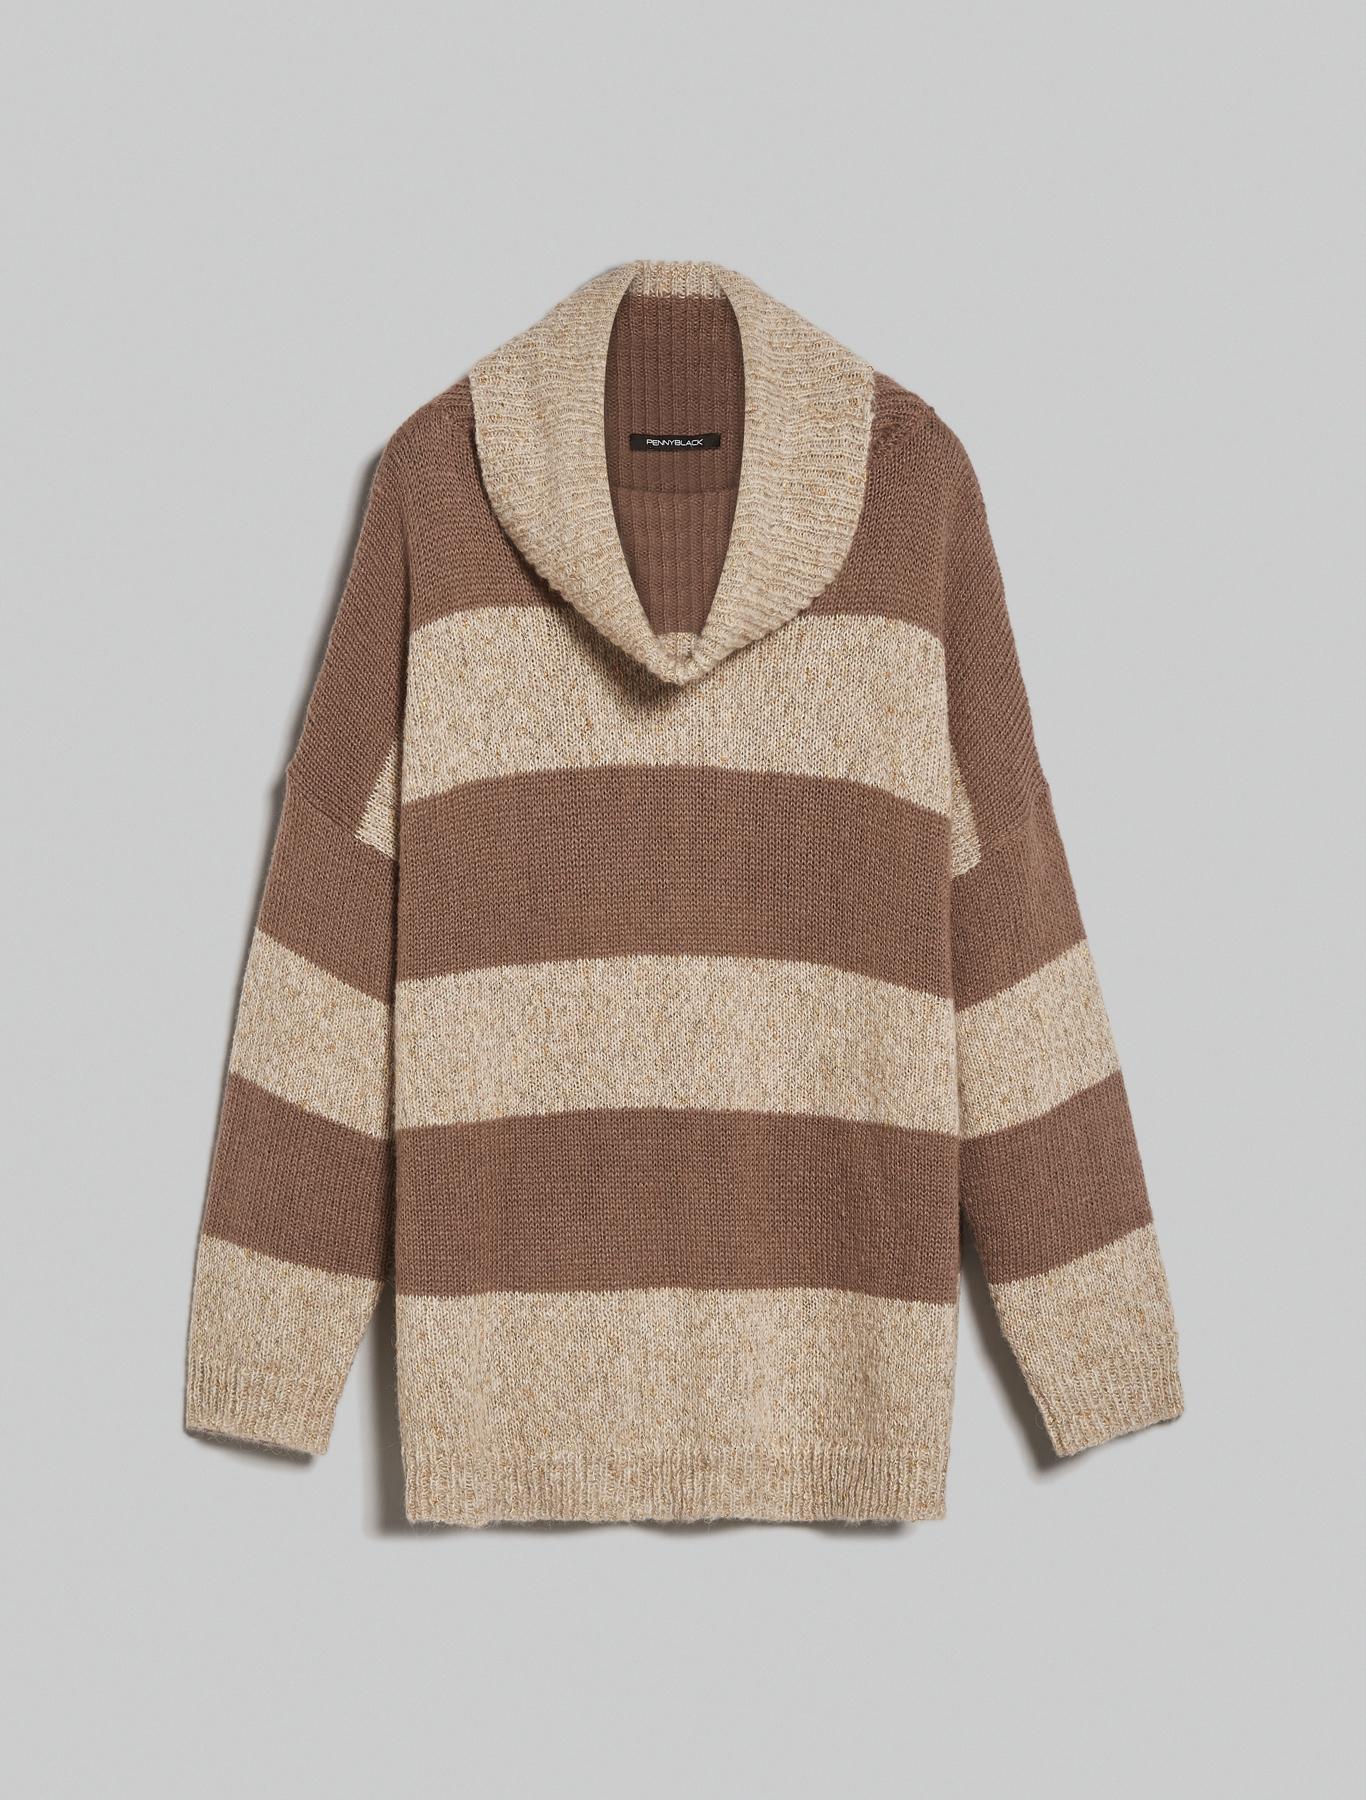 Oversized lamé jumper - beige - pennyblack